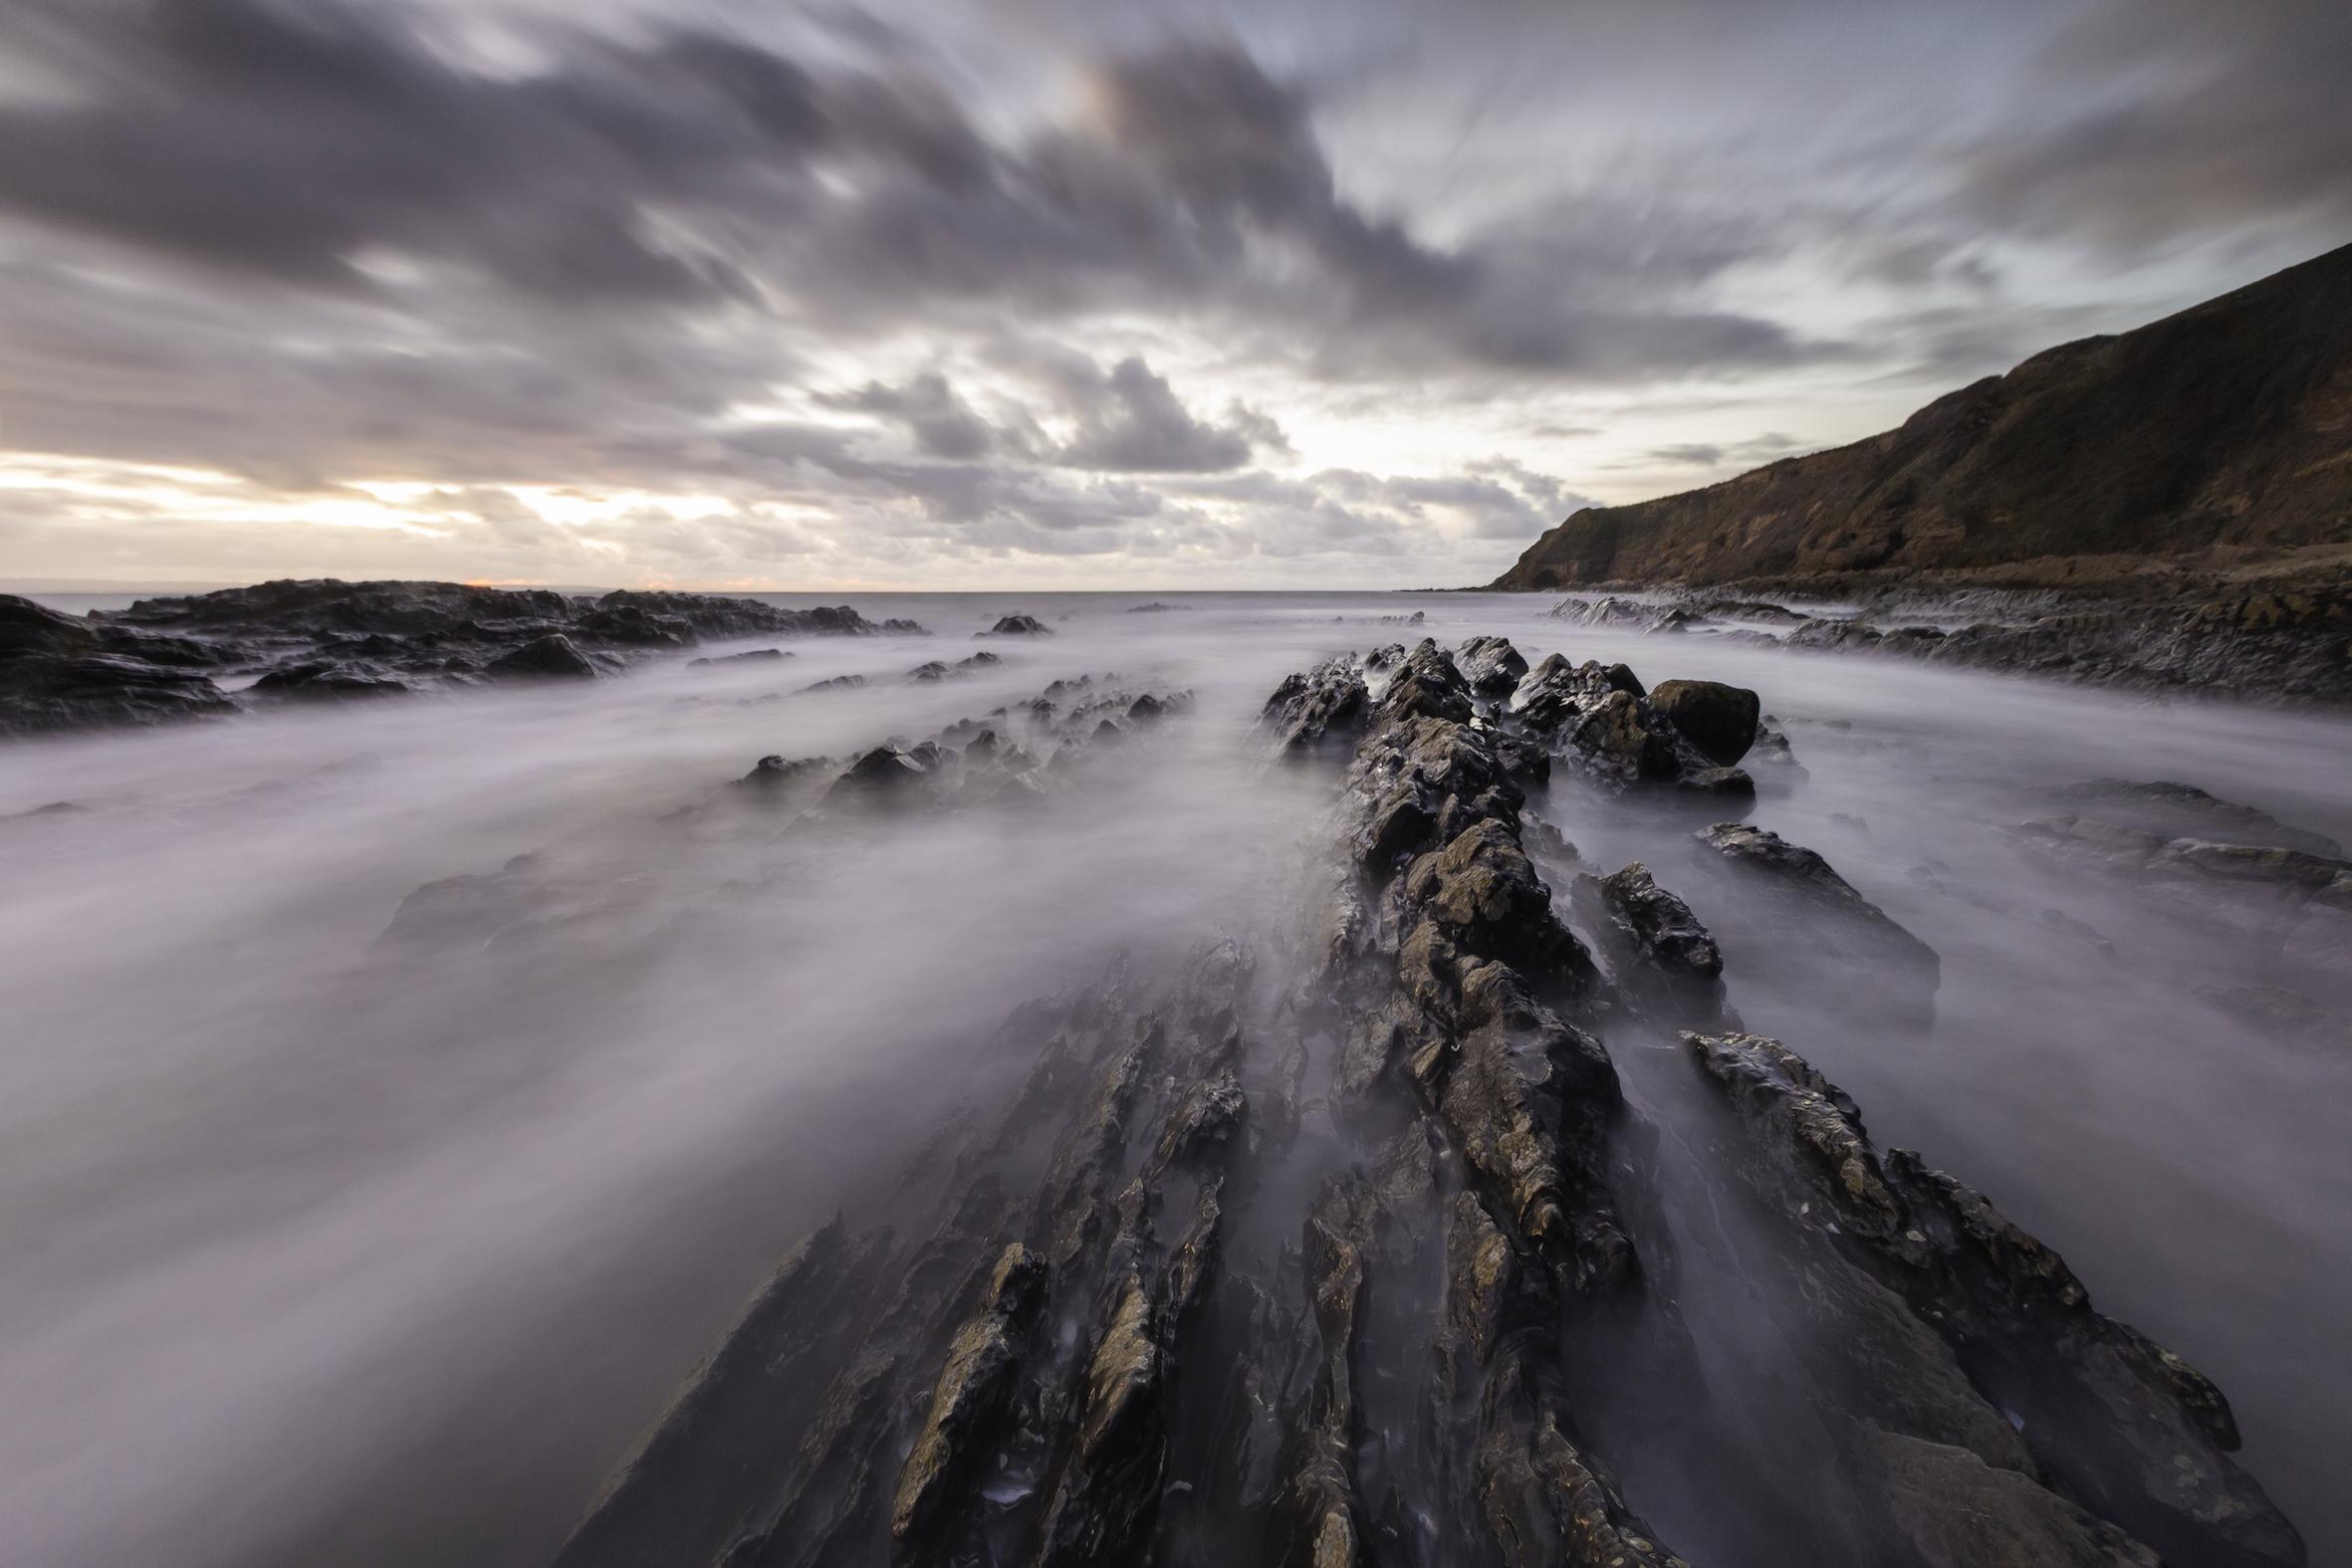 Saunton Sands - Misty Sea